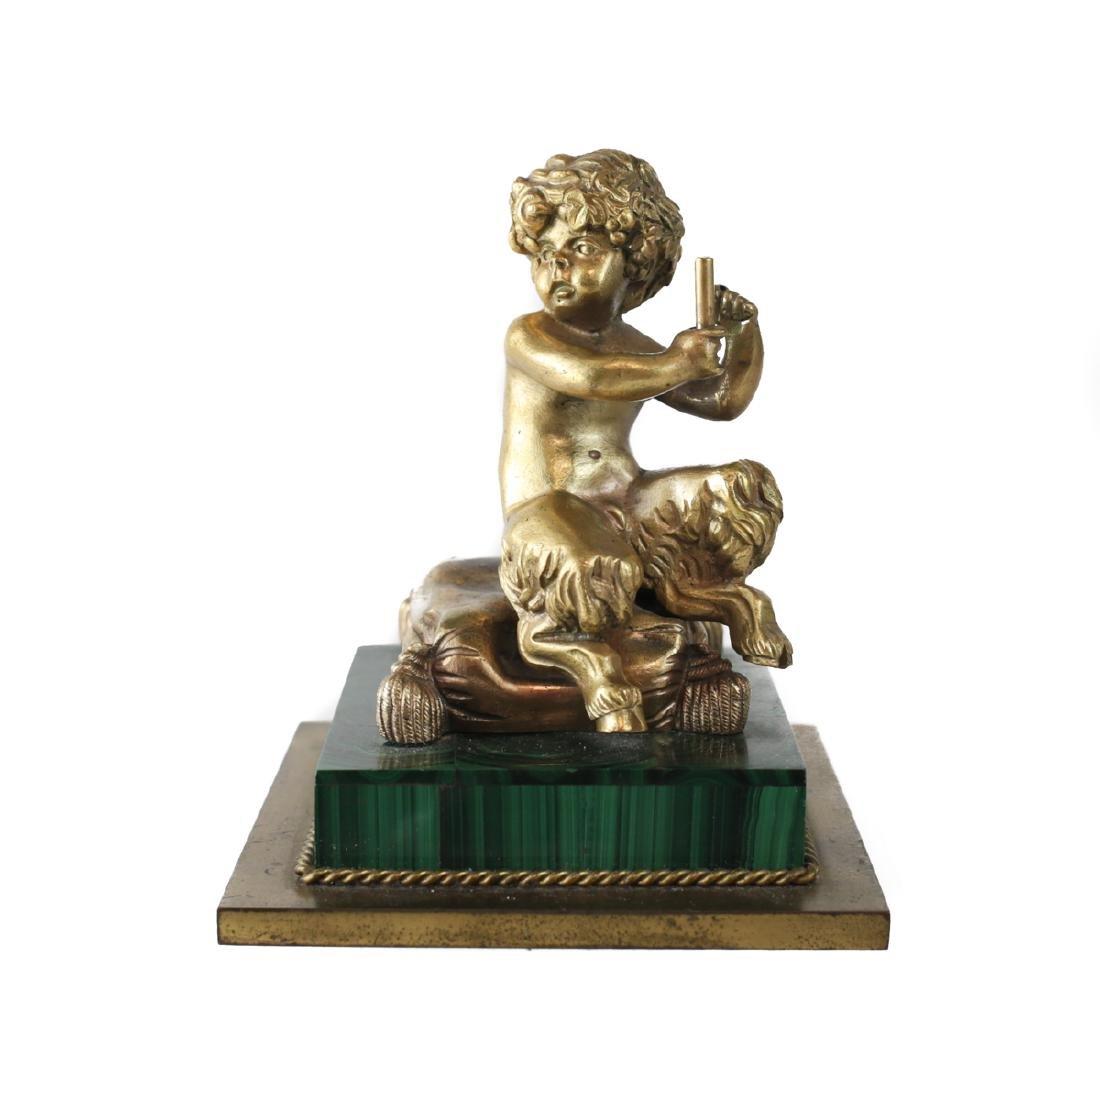 Bronze Putti Figurine on Malachite Base